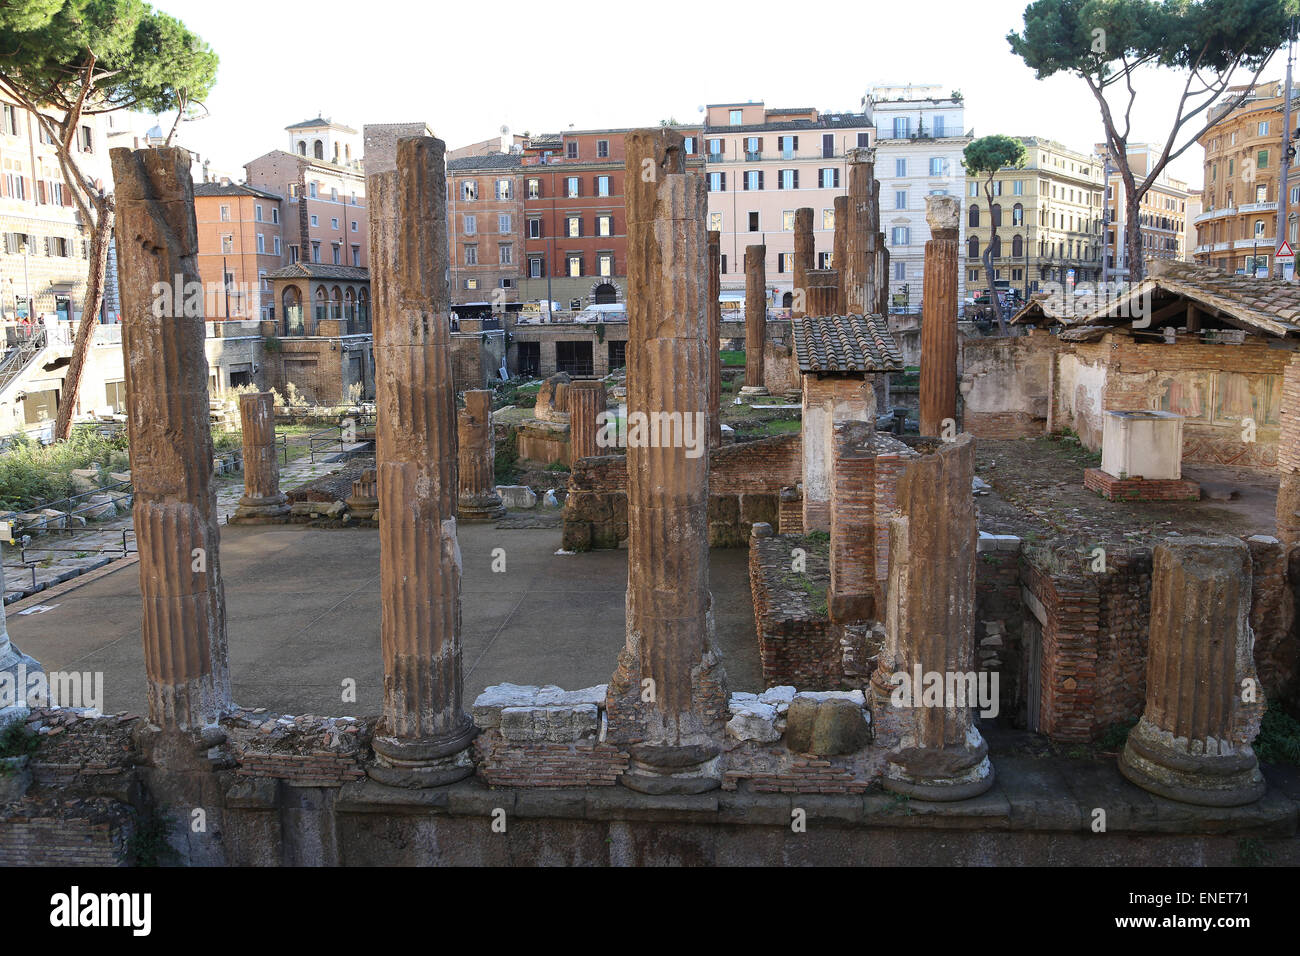 Italy. Rome. The Sacred area of Largo di Torre Argentina. Ruins of Republican Roman temples. Ancient Campus Martius. - Stock Image